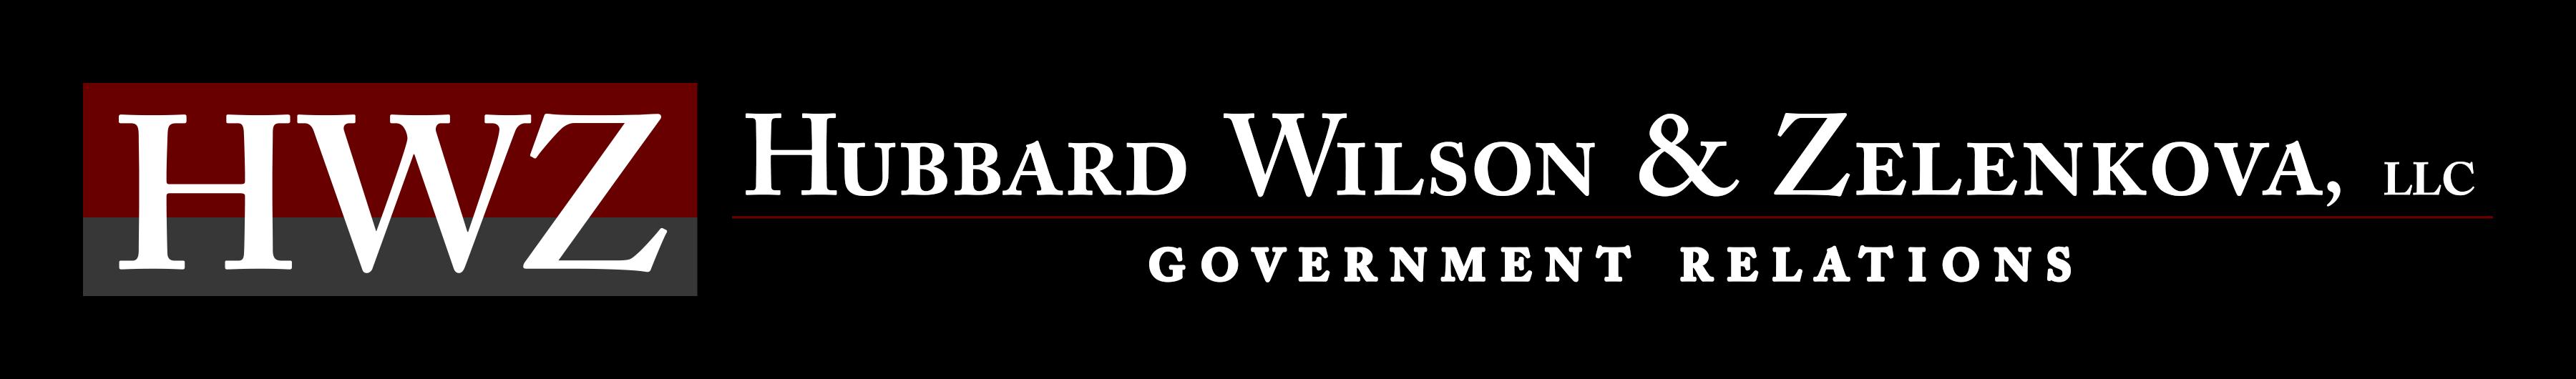 HUBBARD WILSON & ZELENKOVA, LLC.